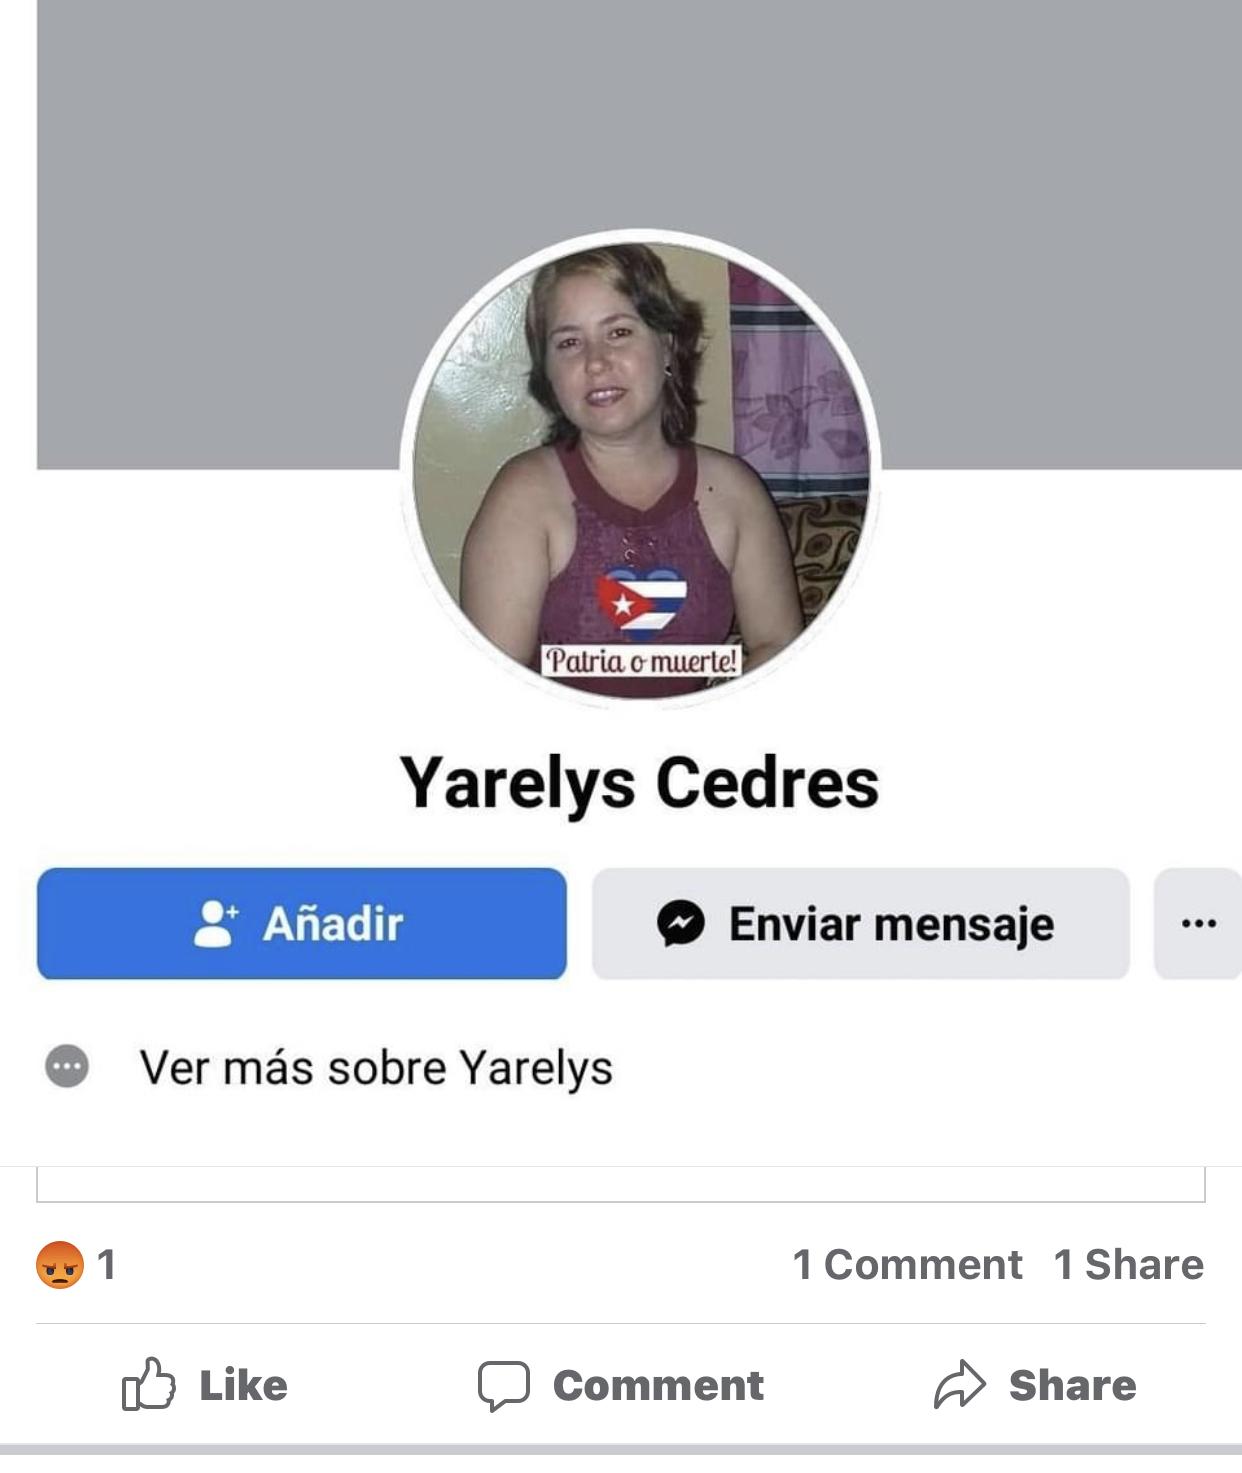 Yarelys Cedres